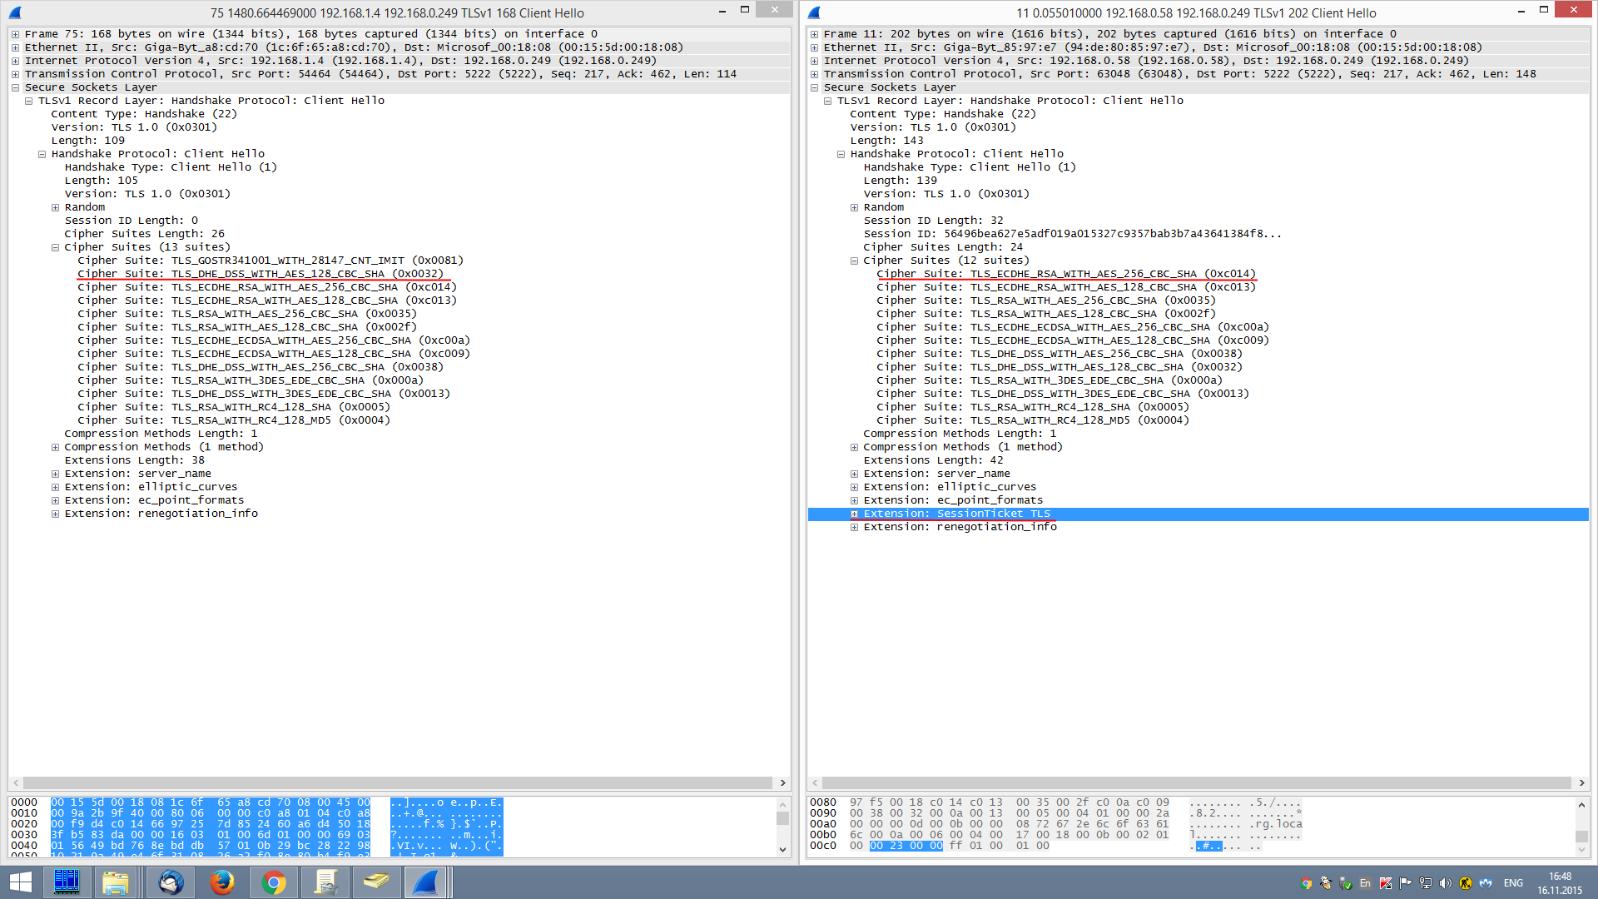 SSL handshake error - Openfire Support - Ignite Realtime